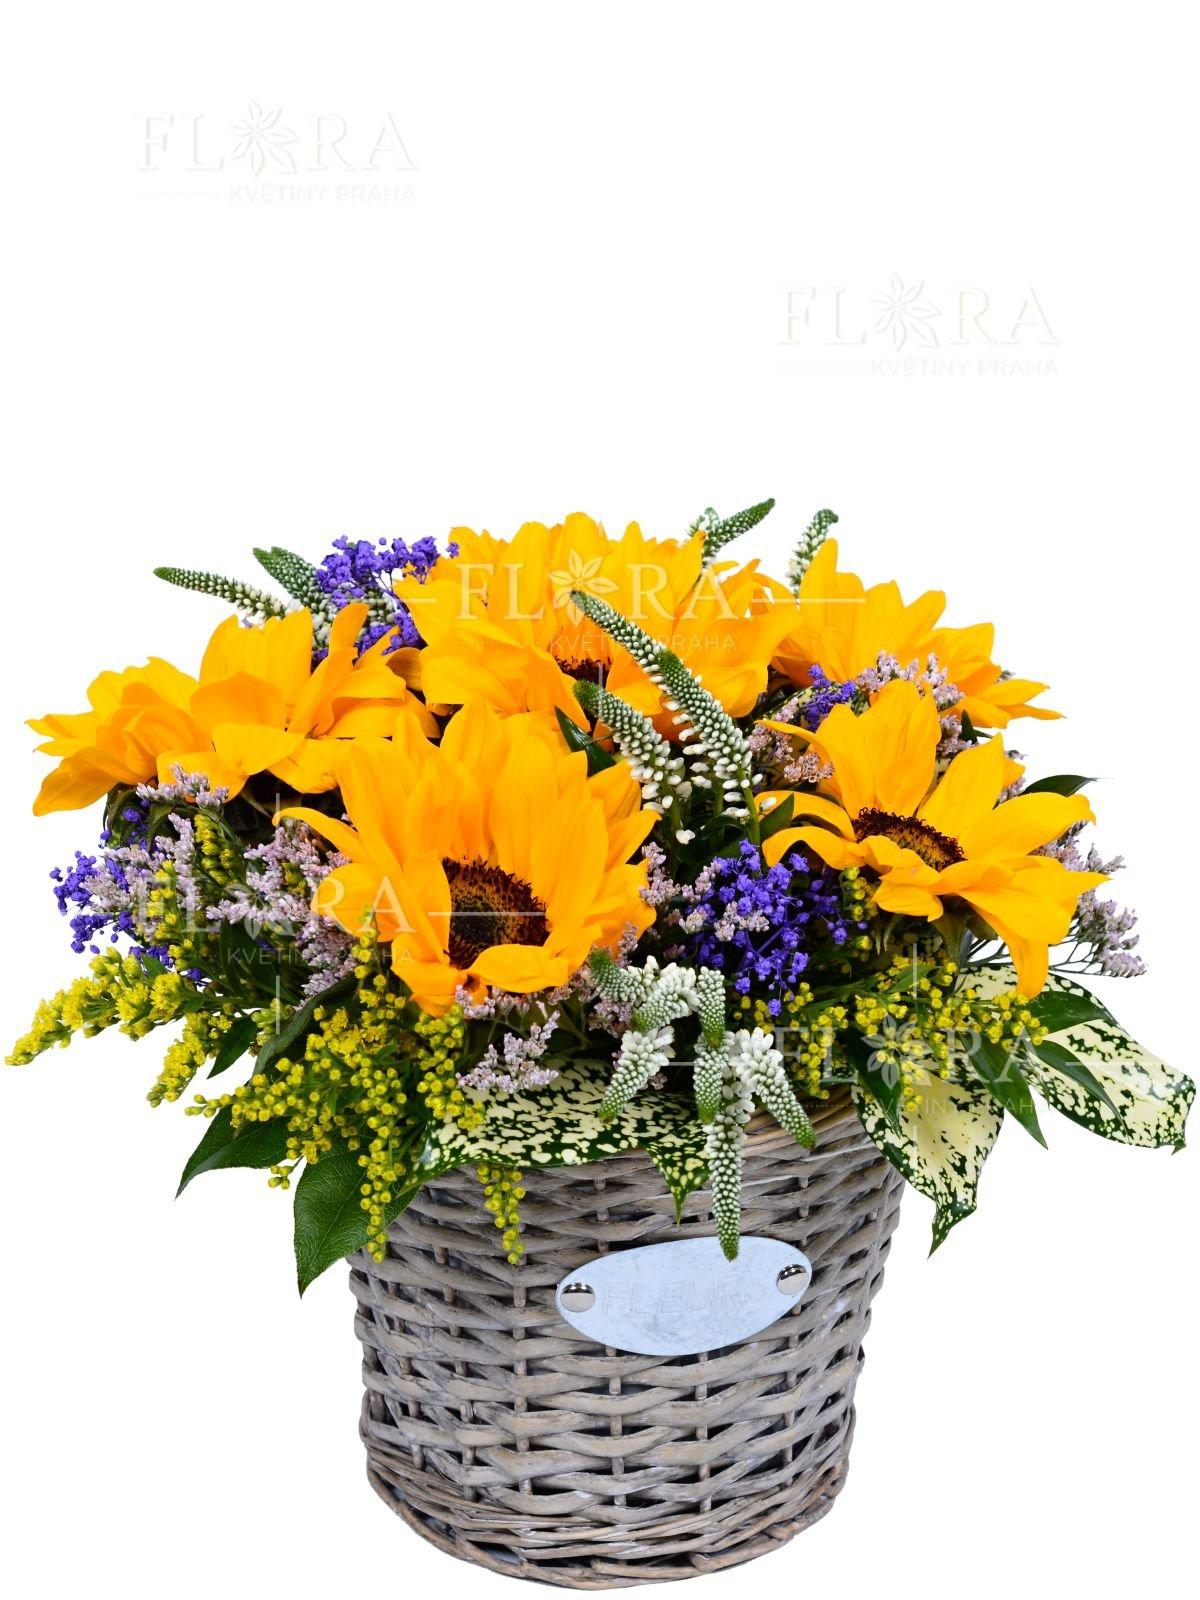 Flower basket sarah mixed bouguet and sunflowers flora kvtiny praha discount 100 k on your next purchase beautiful flower basket izmirmasajfo